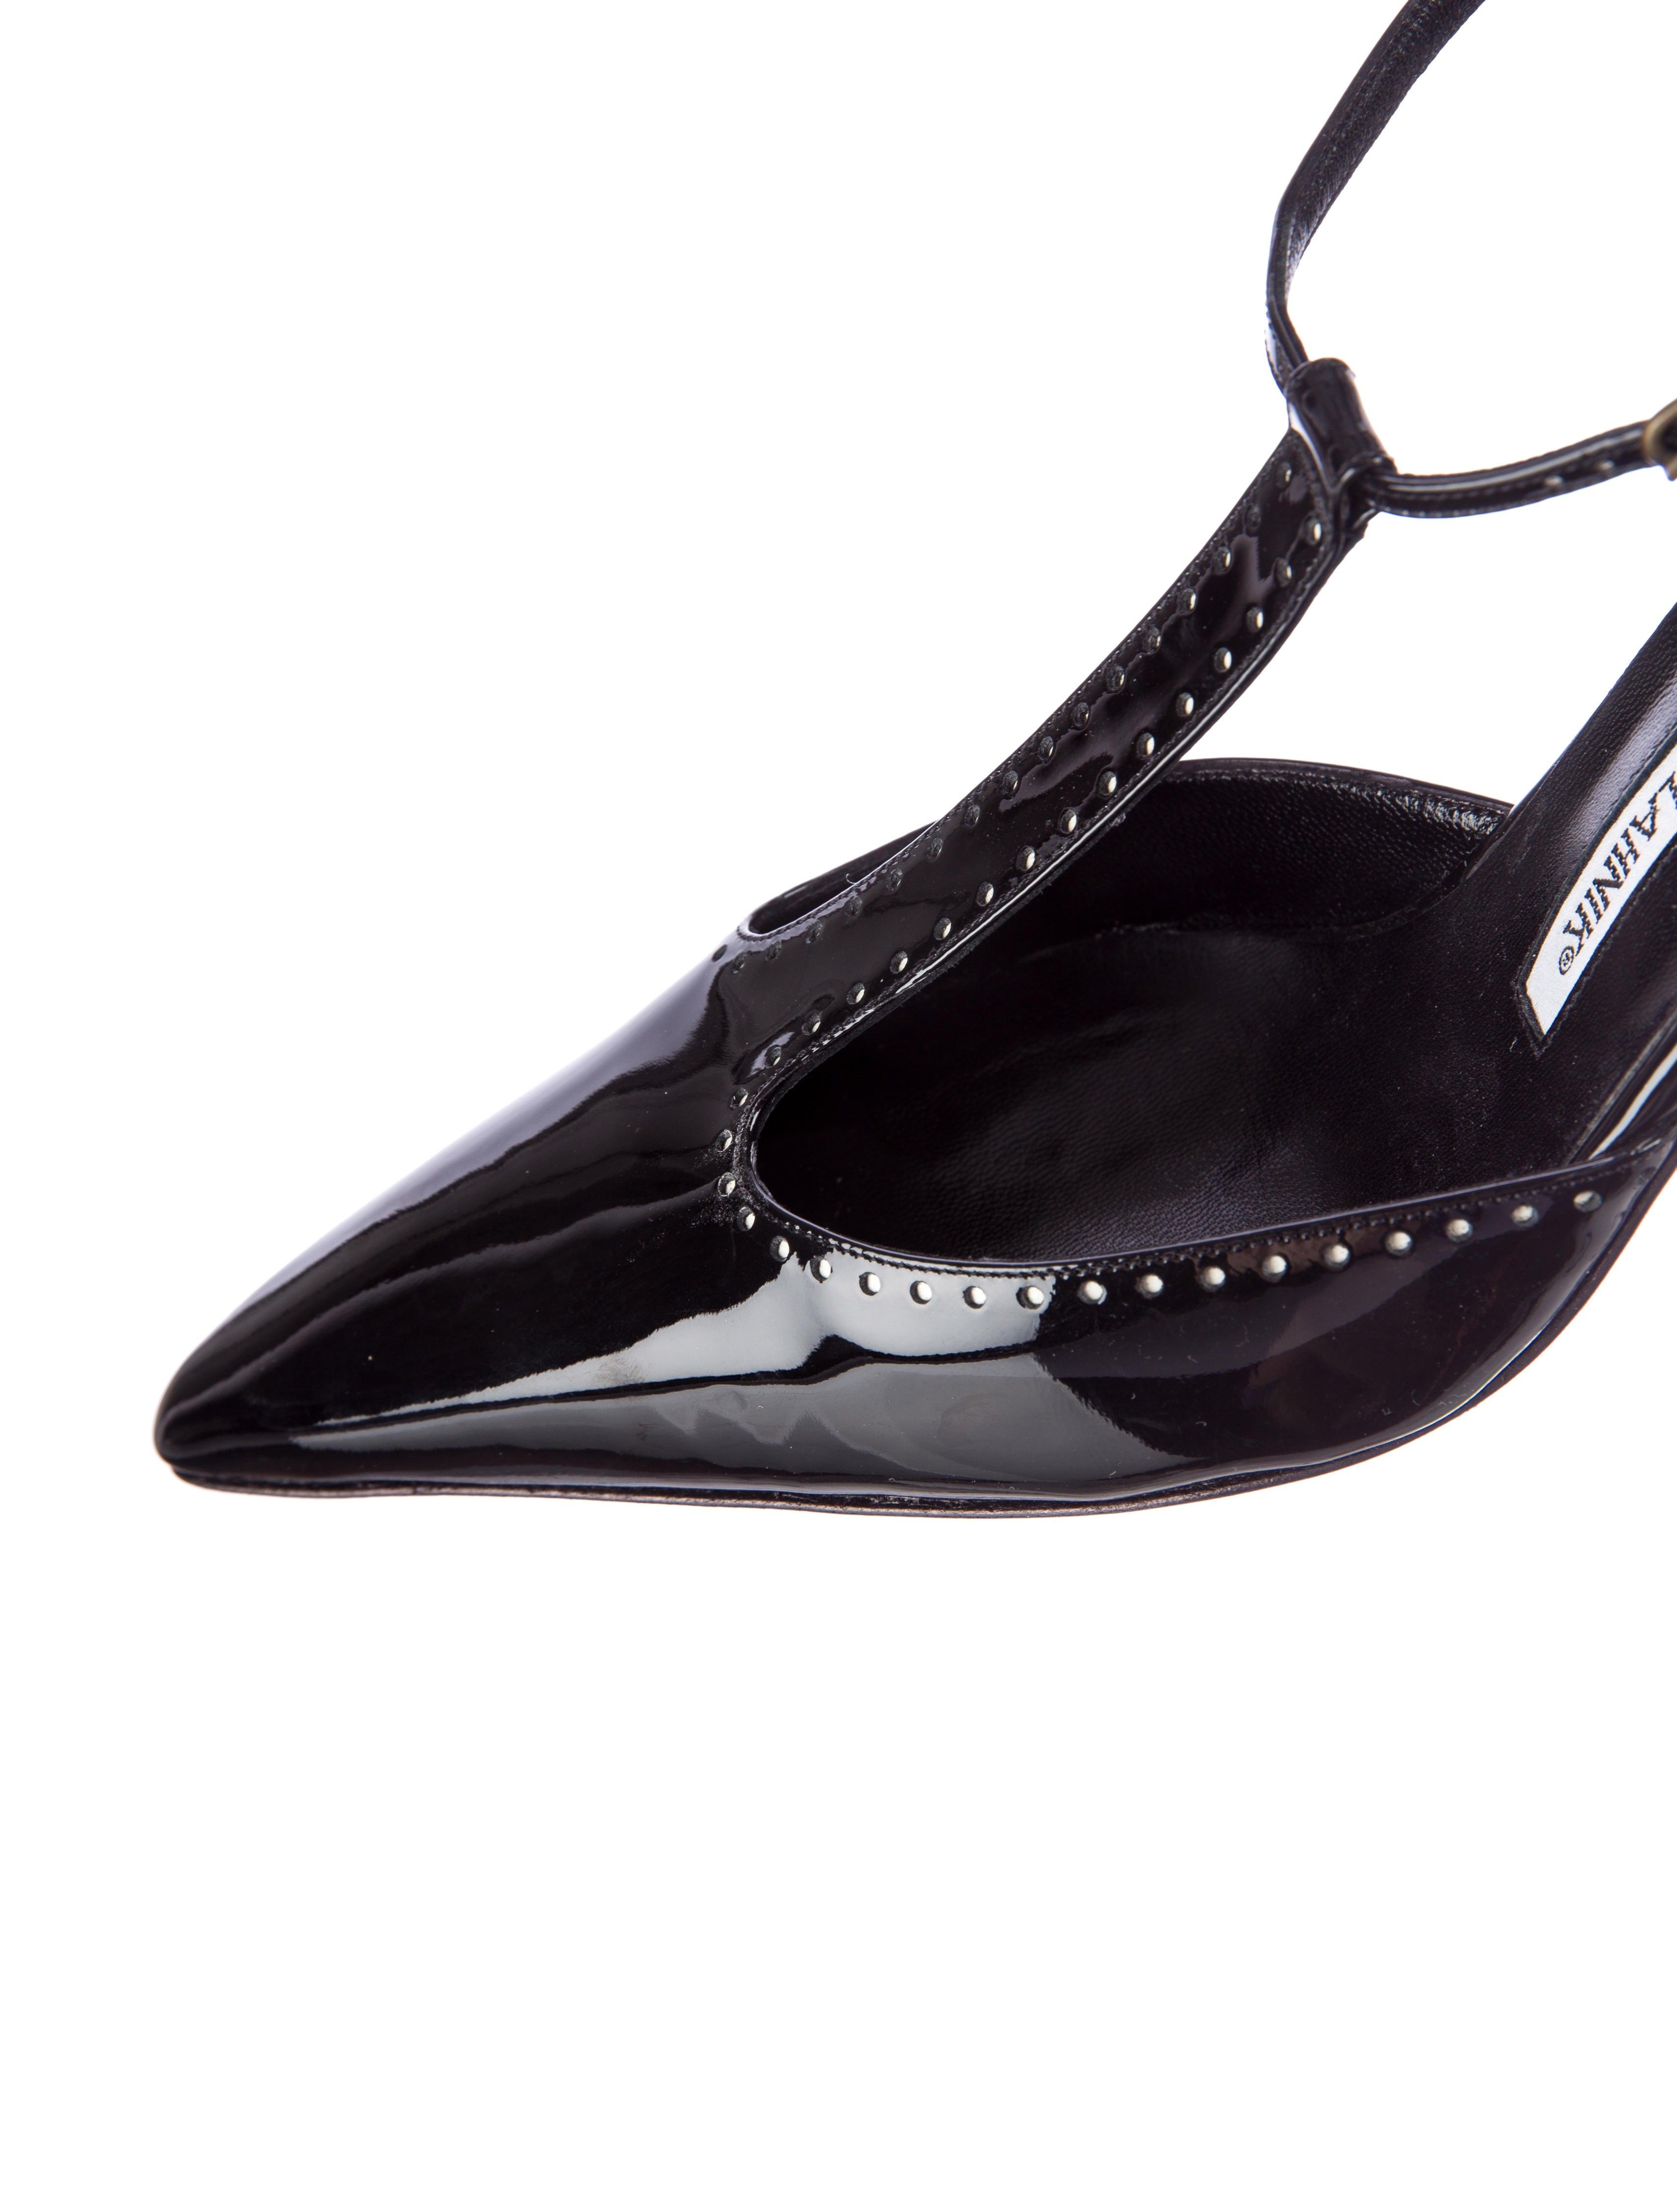 manolo blahnik t strap pumps shoes moo33039 the realreal. Black Bedroom Furniture Sets. Home Design Ideas